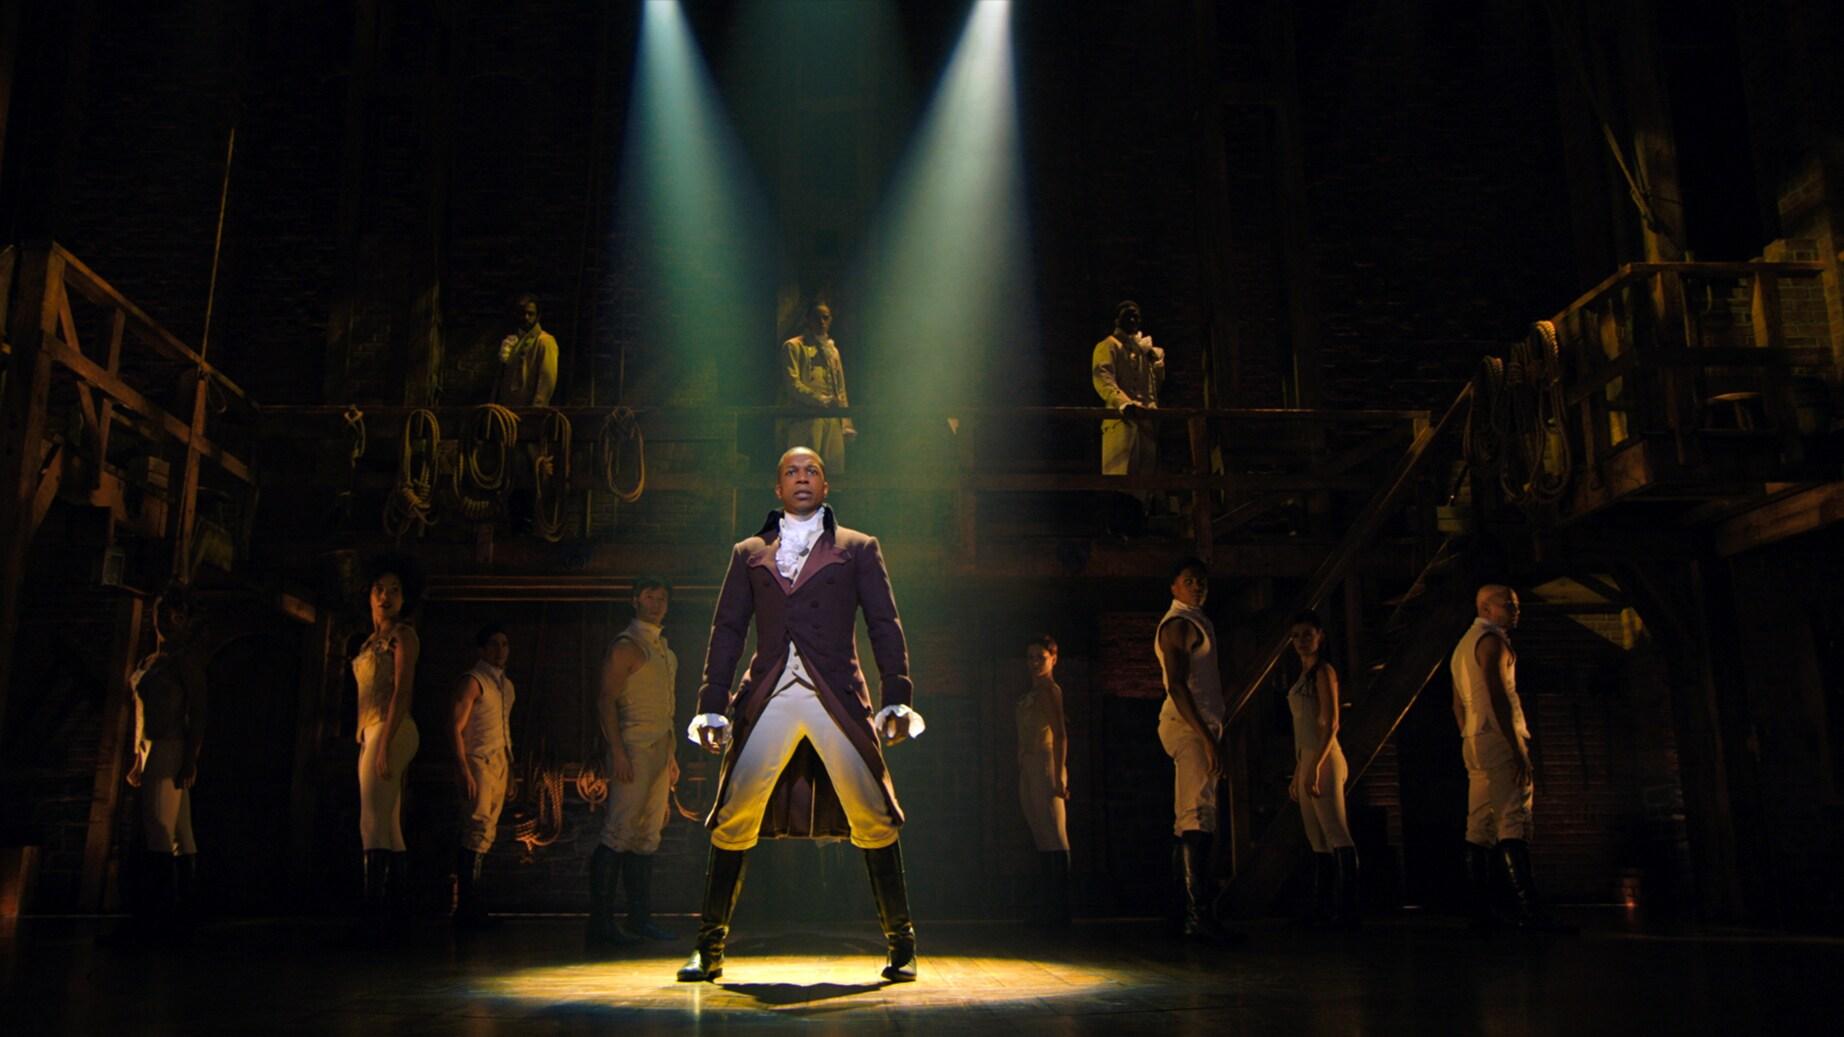 Leslie Odom, Jr. is Aaron Burr in HAMILTON, the filmed version of the original Broadway production.